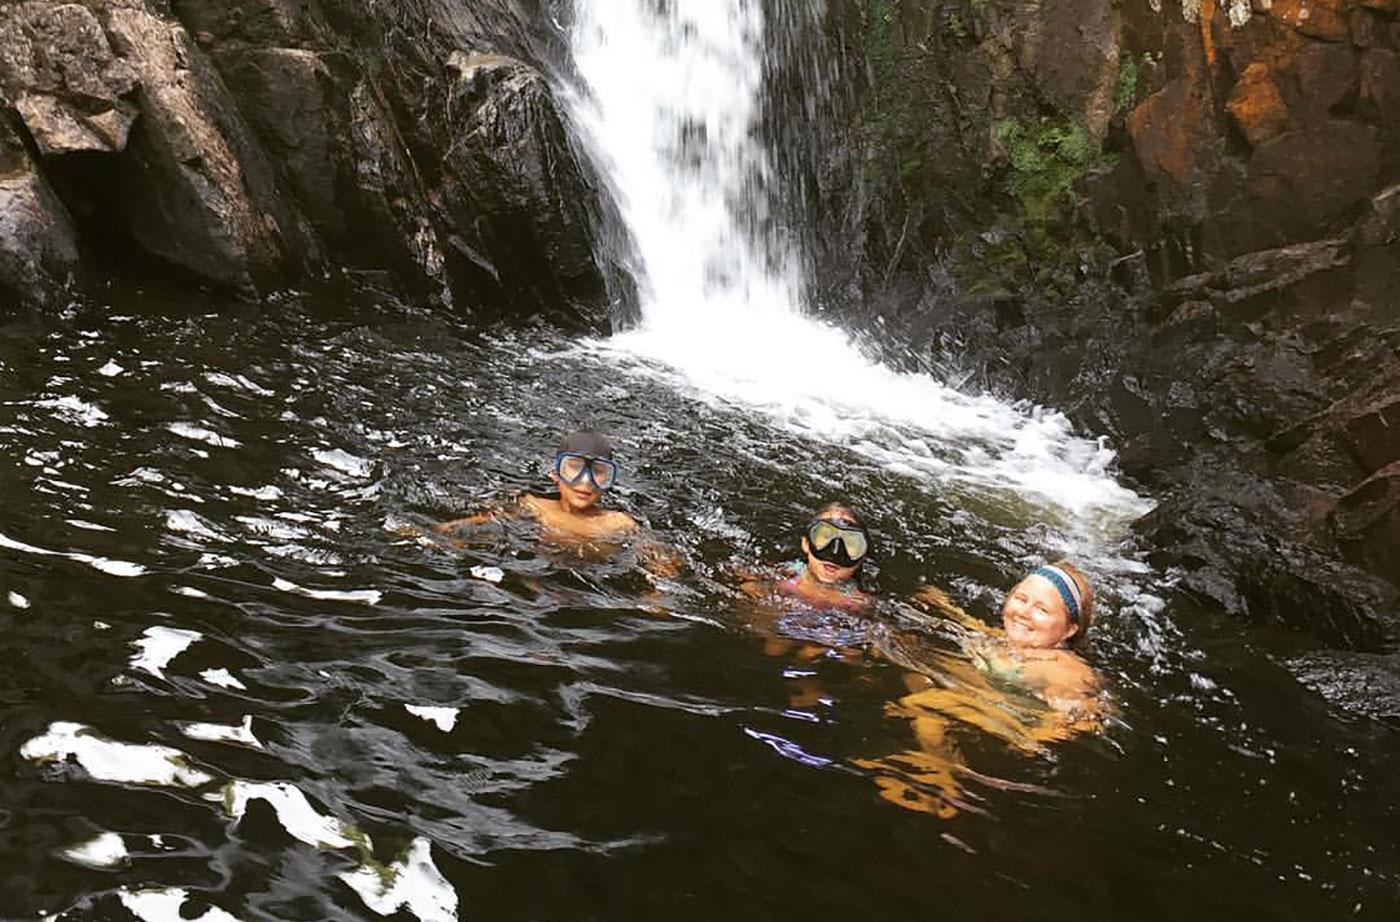 Tumbledown Dick Falls